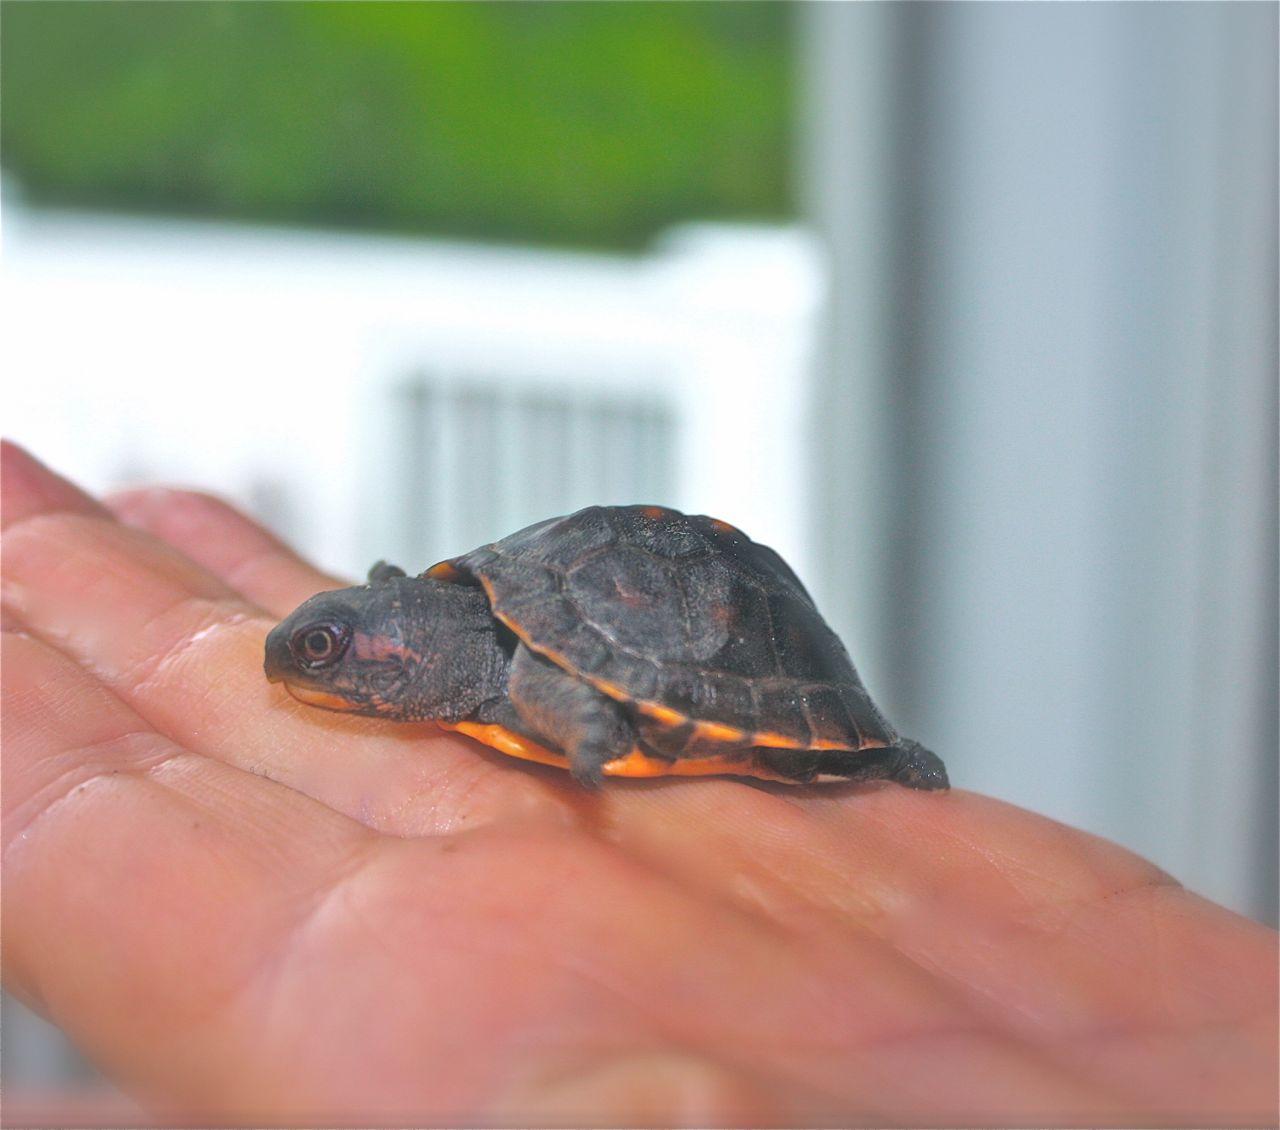 Baby Turtle Passing Through.. Breaking New Ground in Zone 5